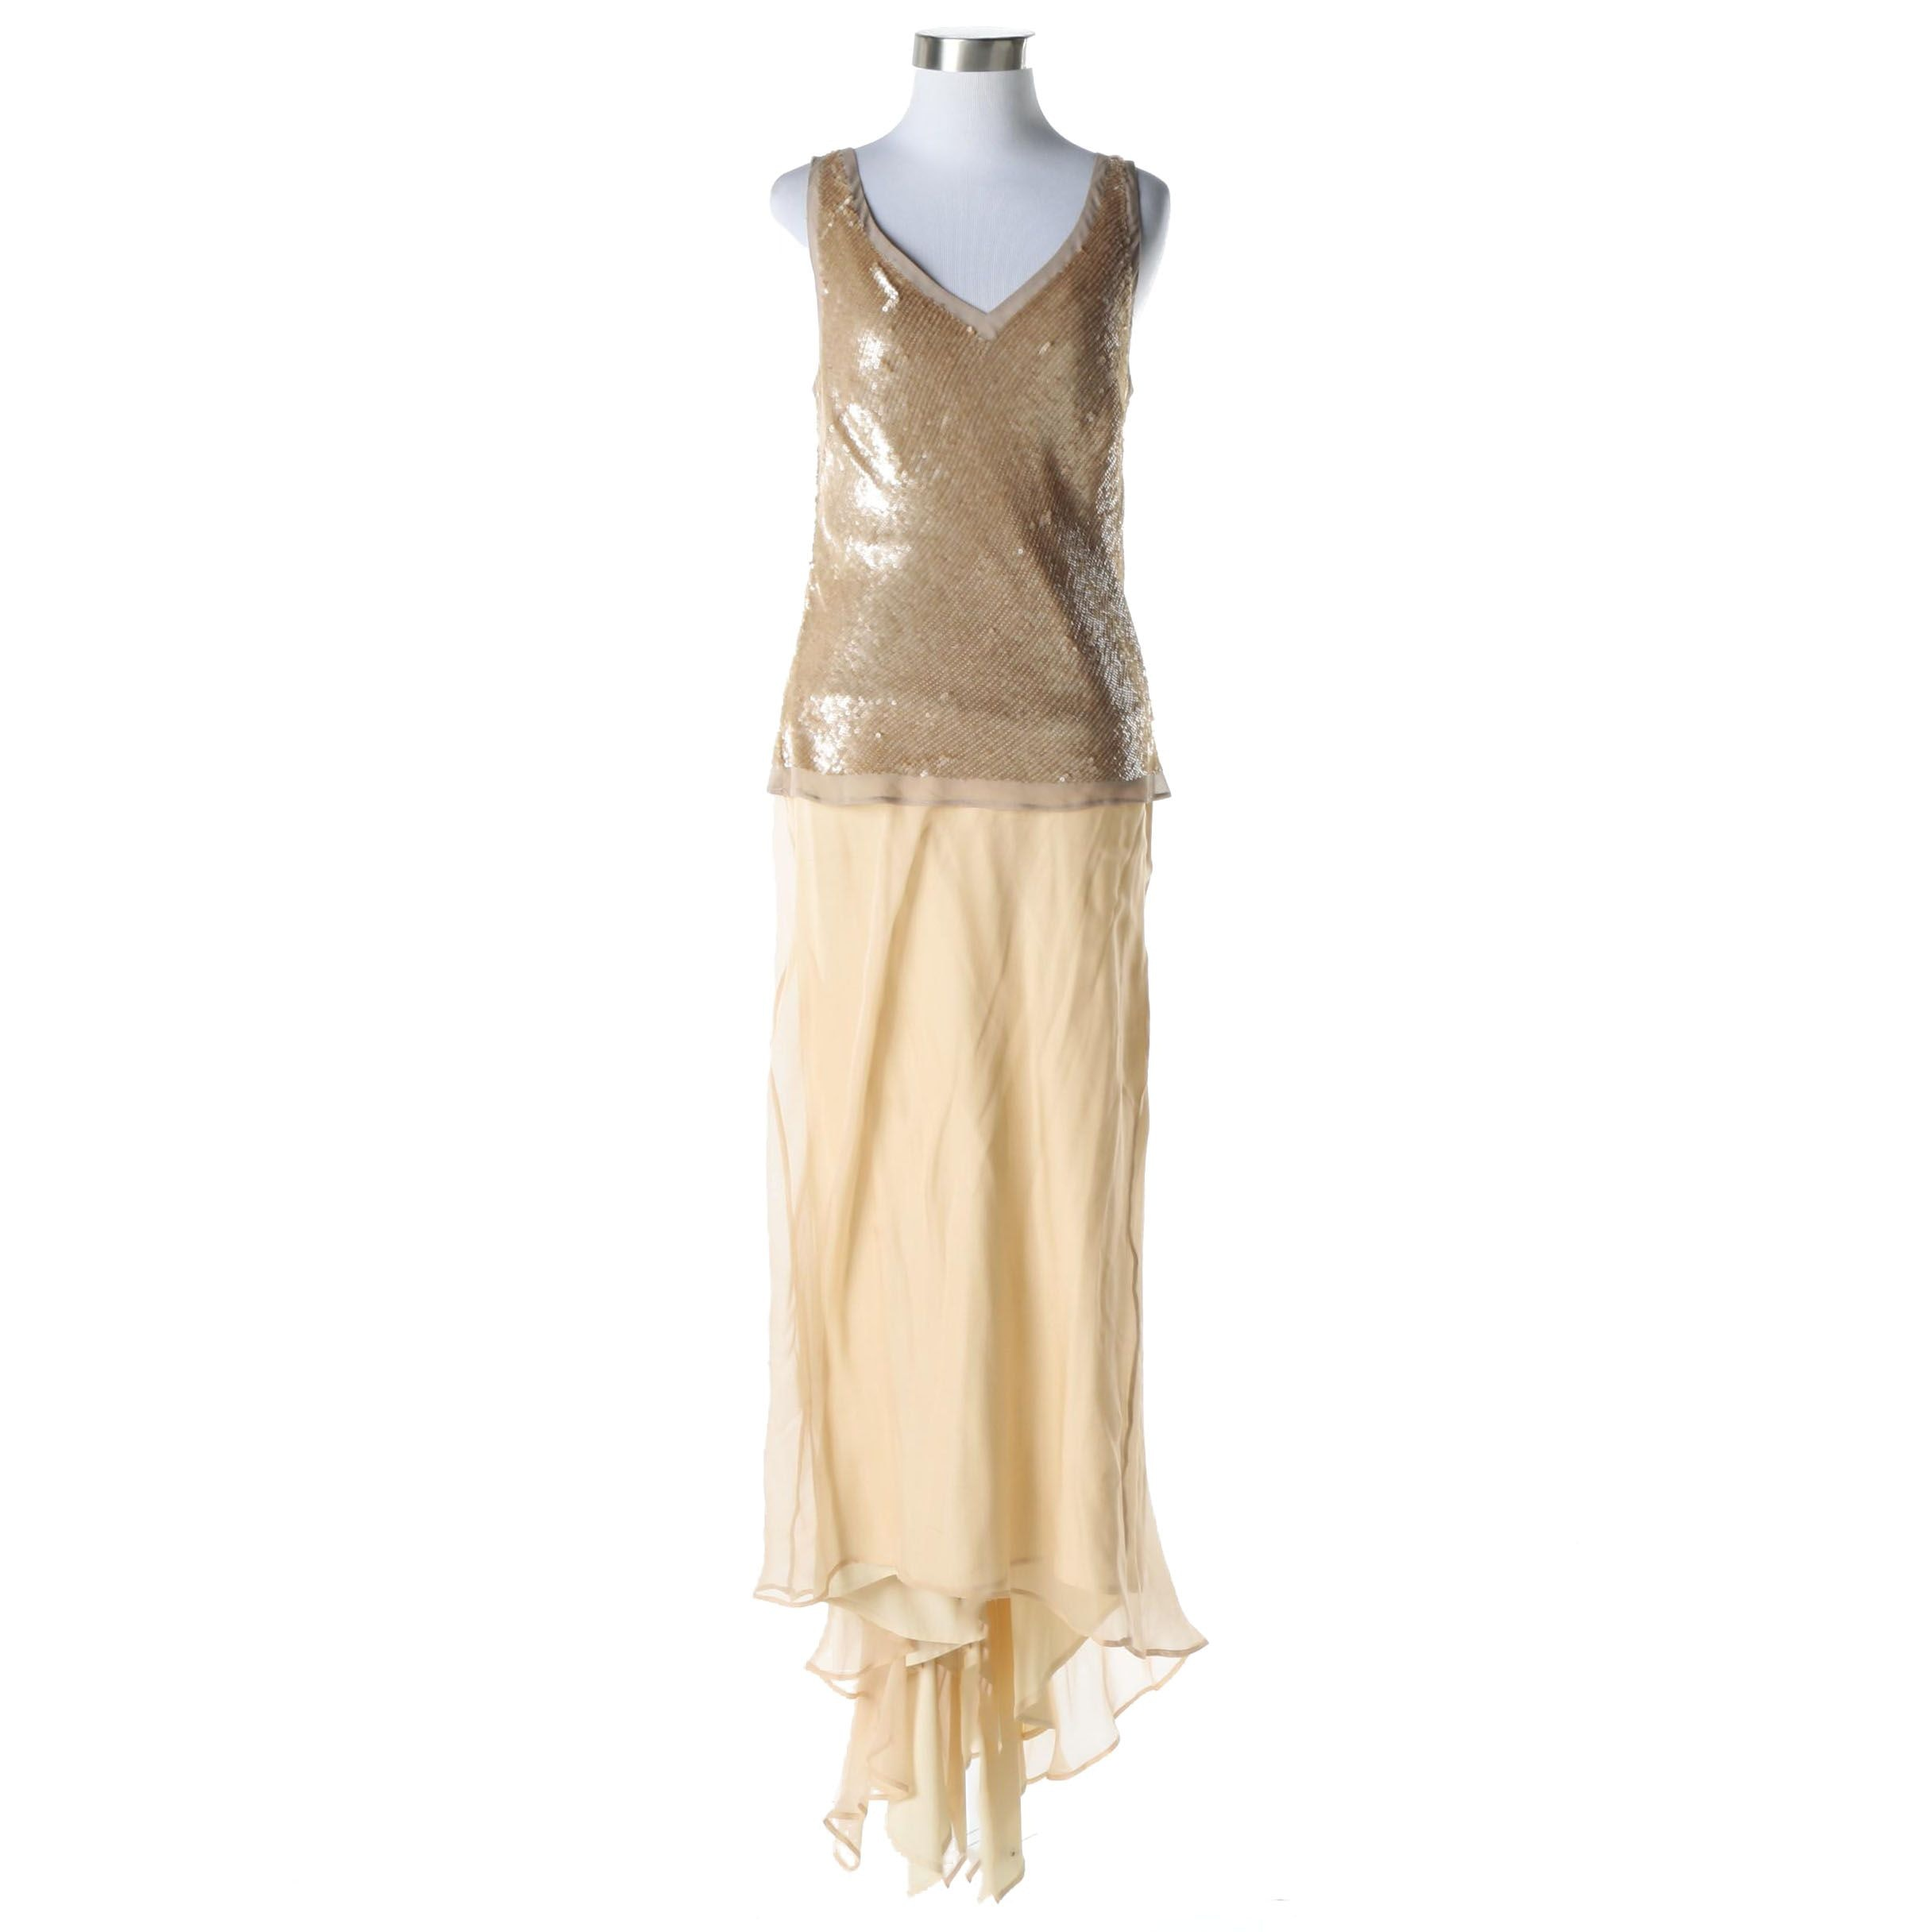 Adrianna Papell Evening Essentials Silk Sequin Top and Silk Skirt